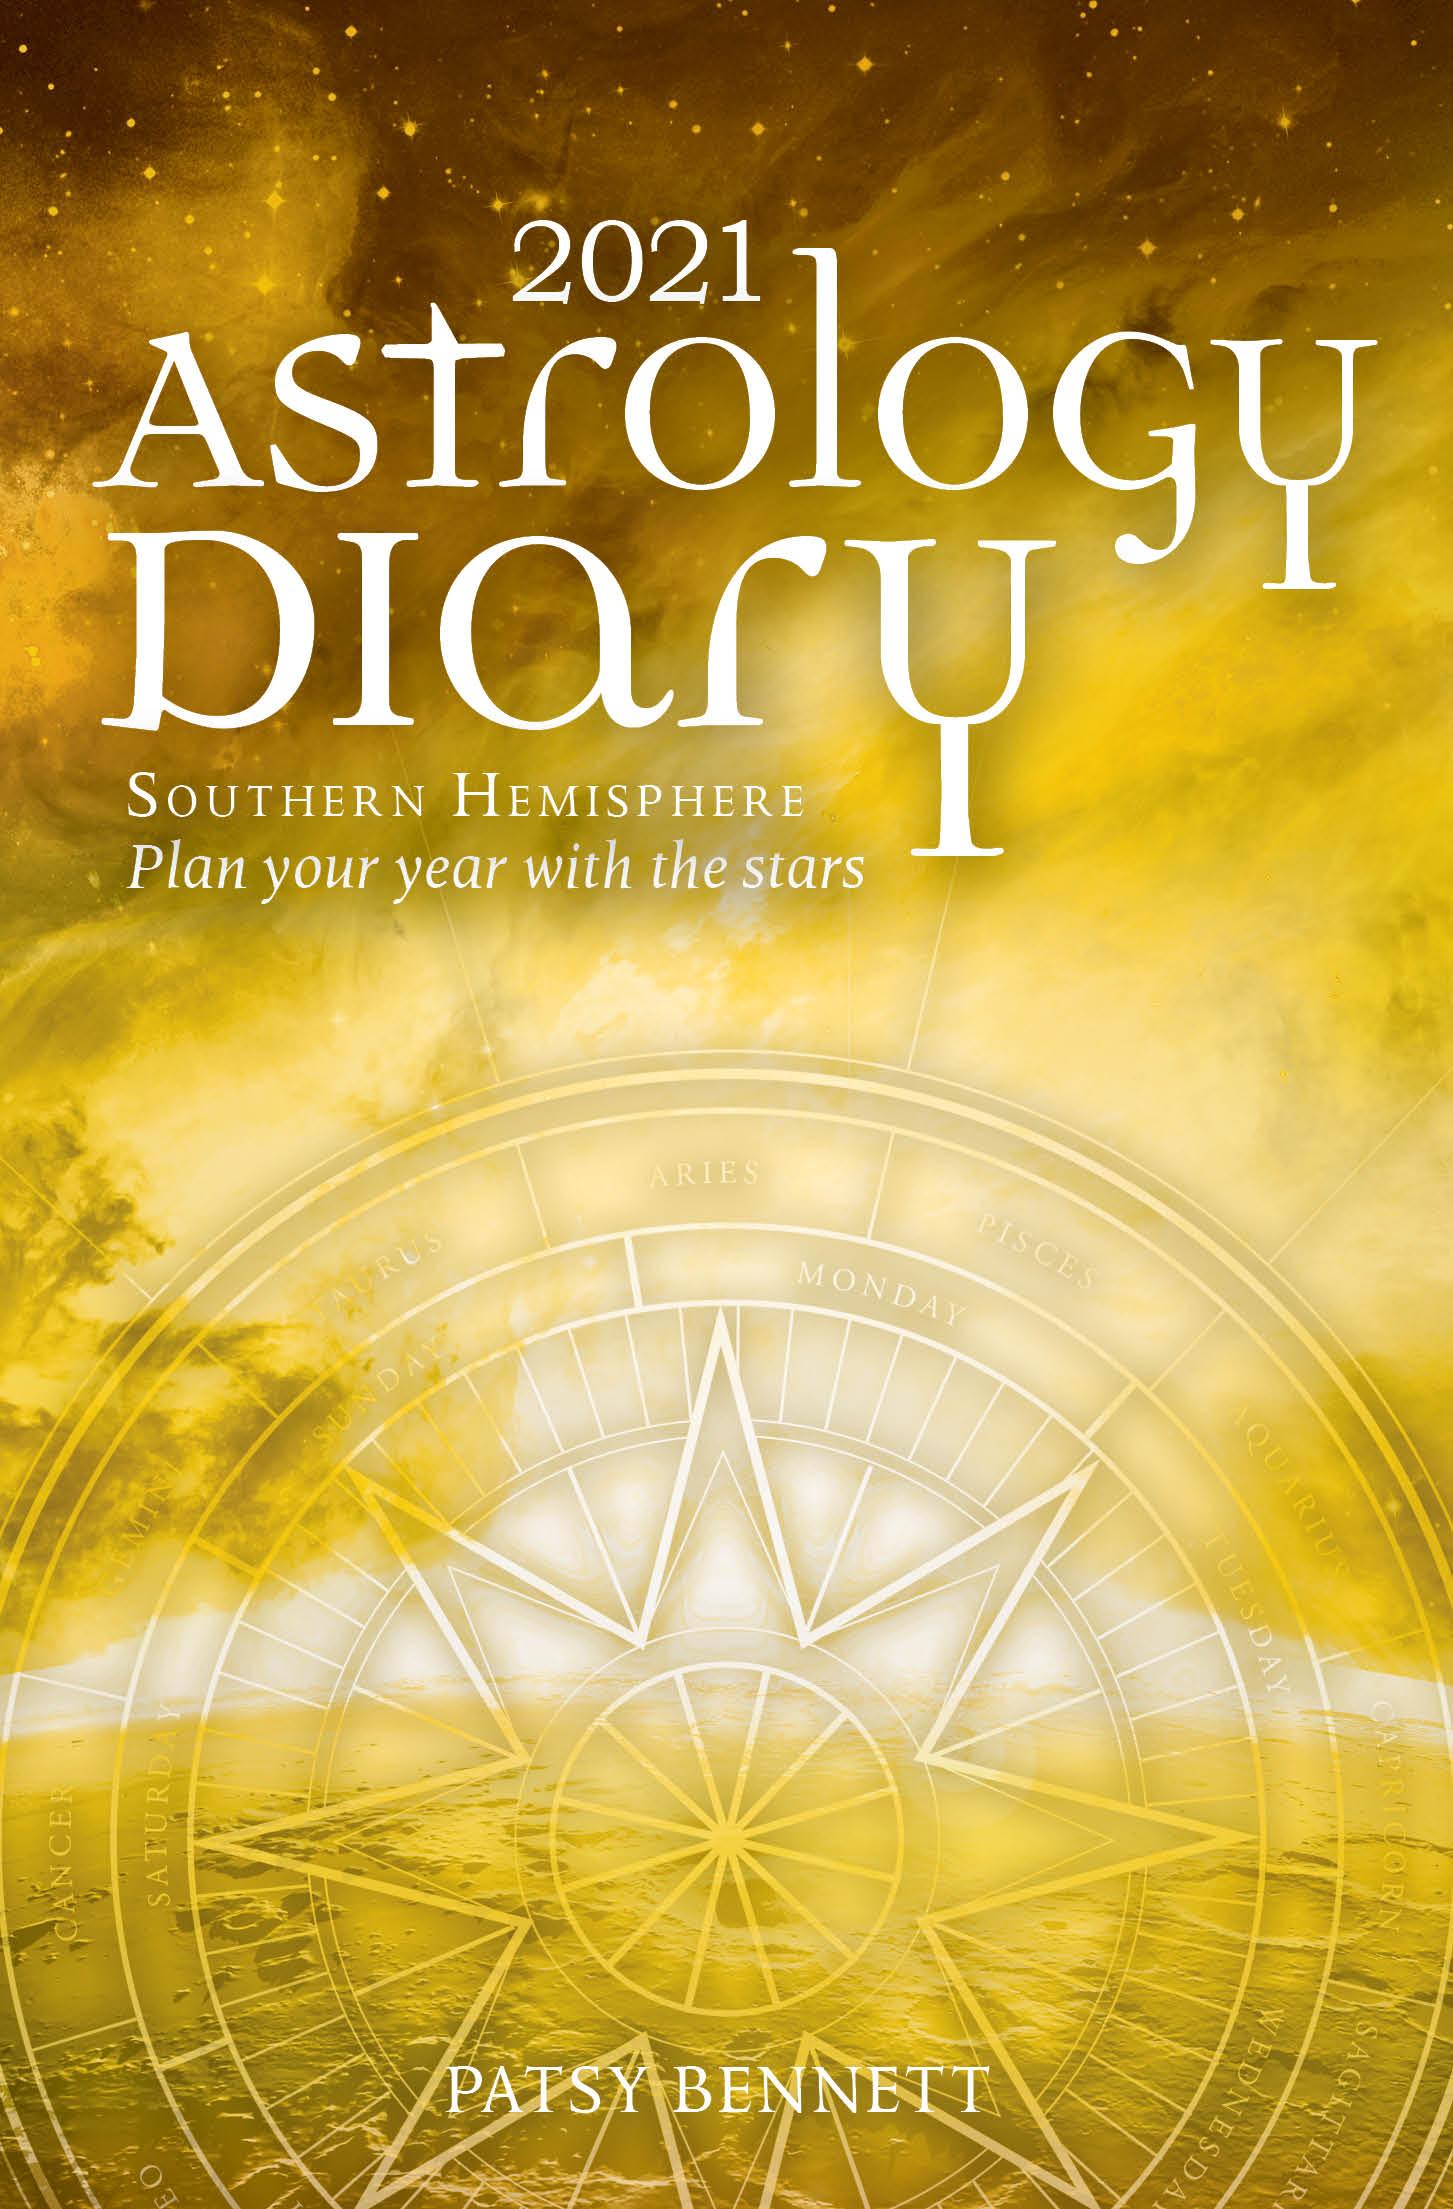 2021 Astrology Diary - Southern Hemisphere